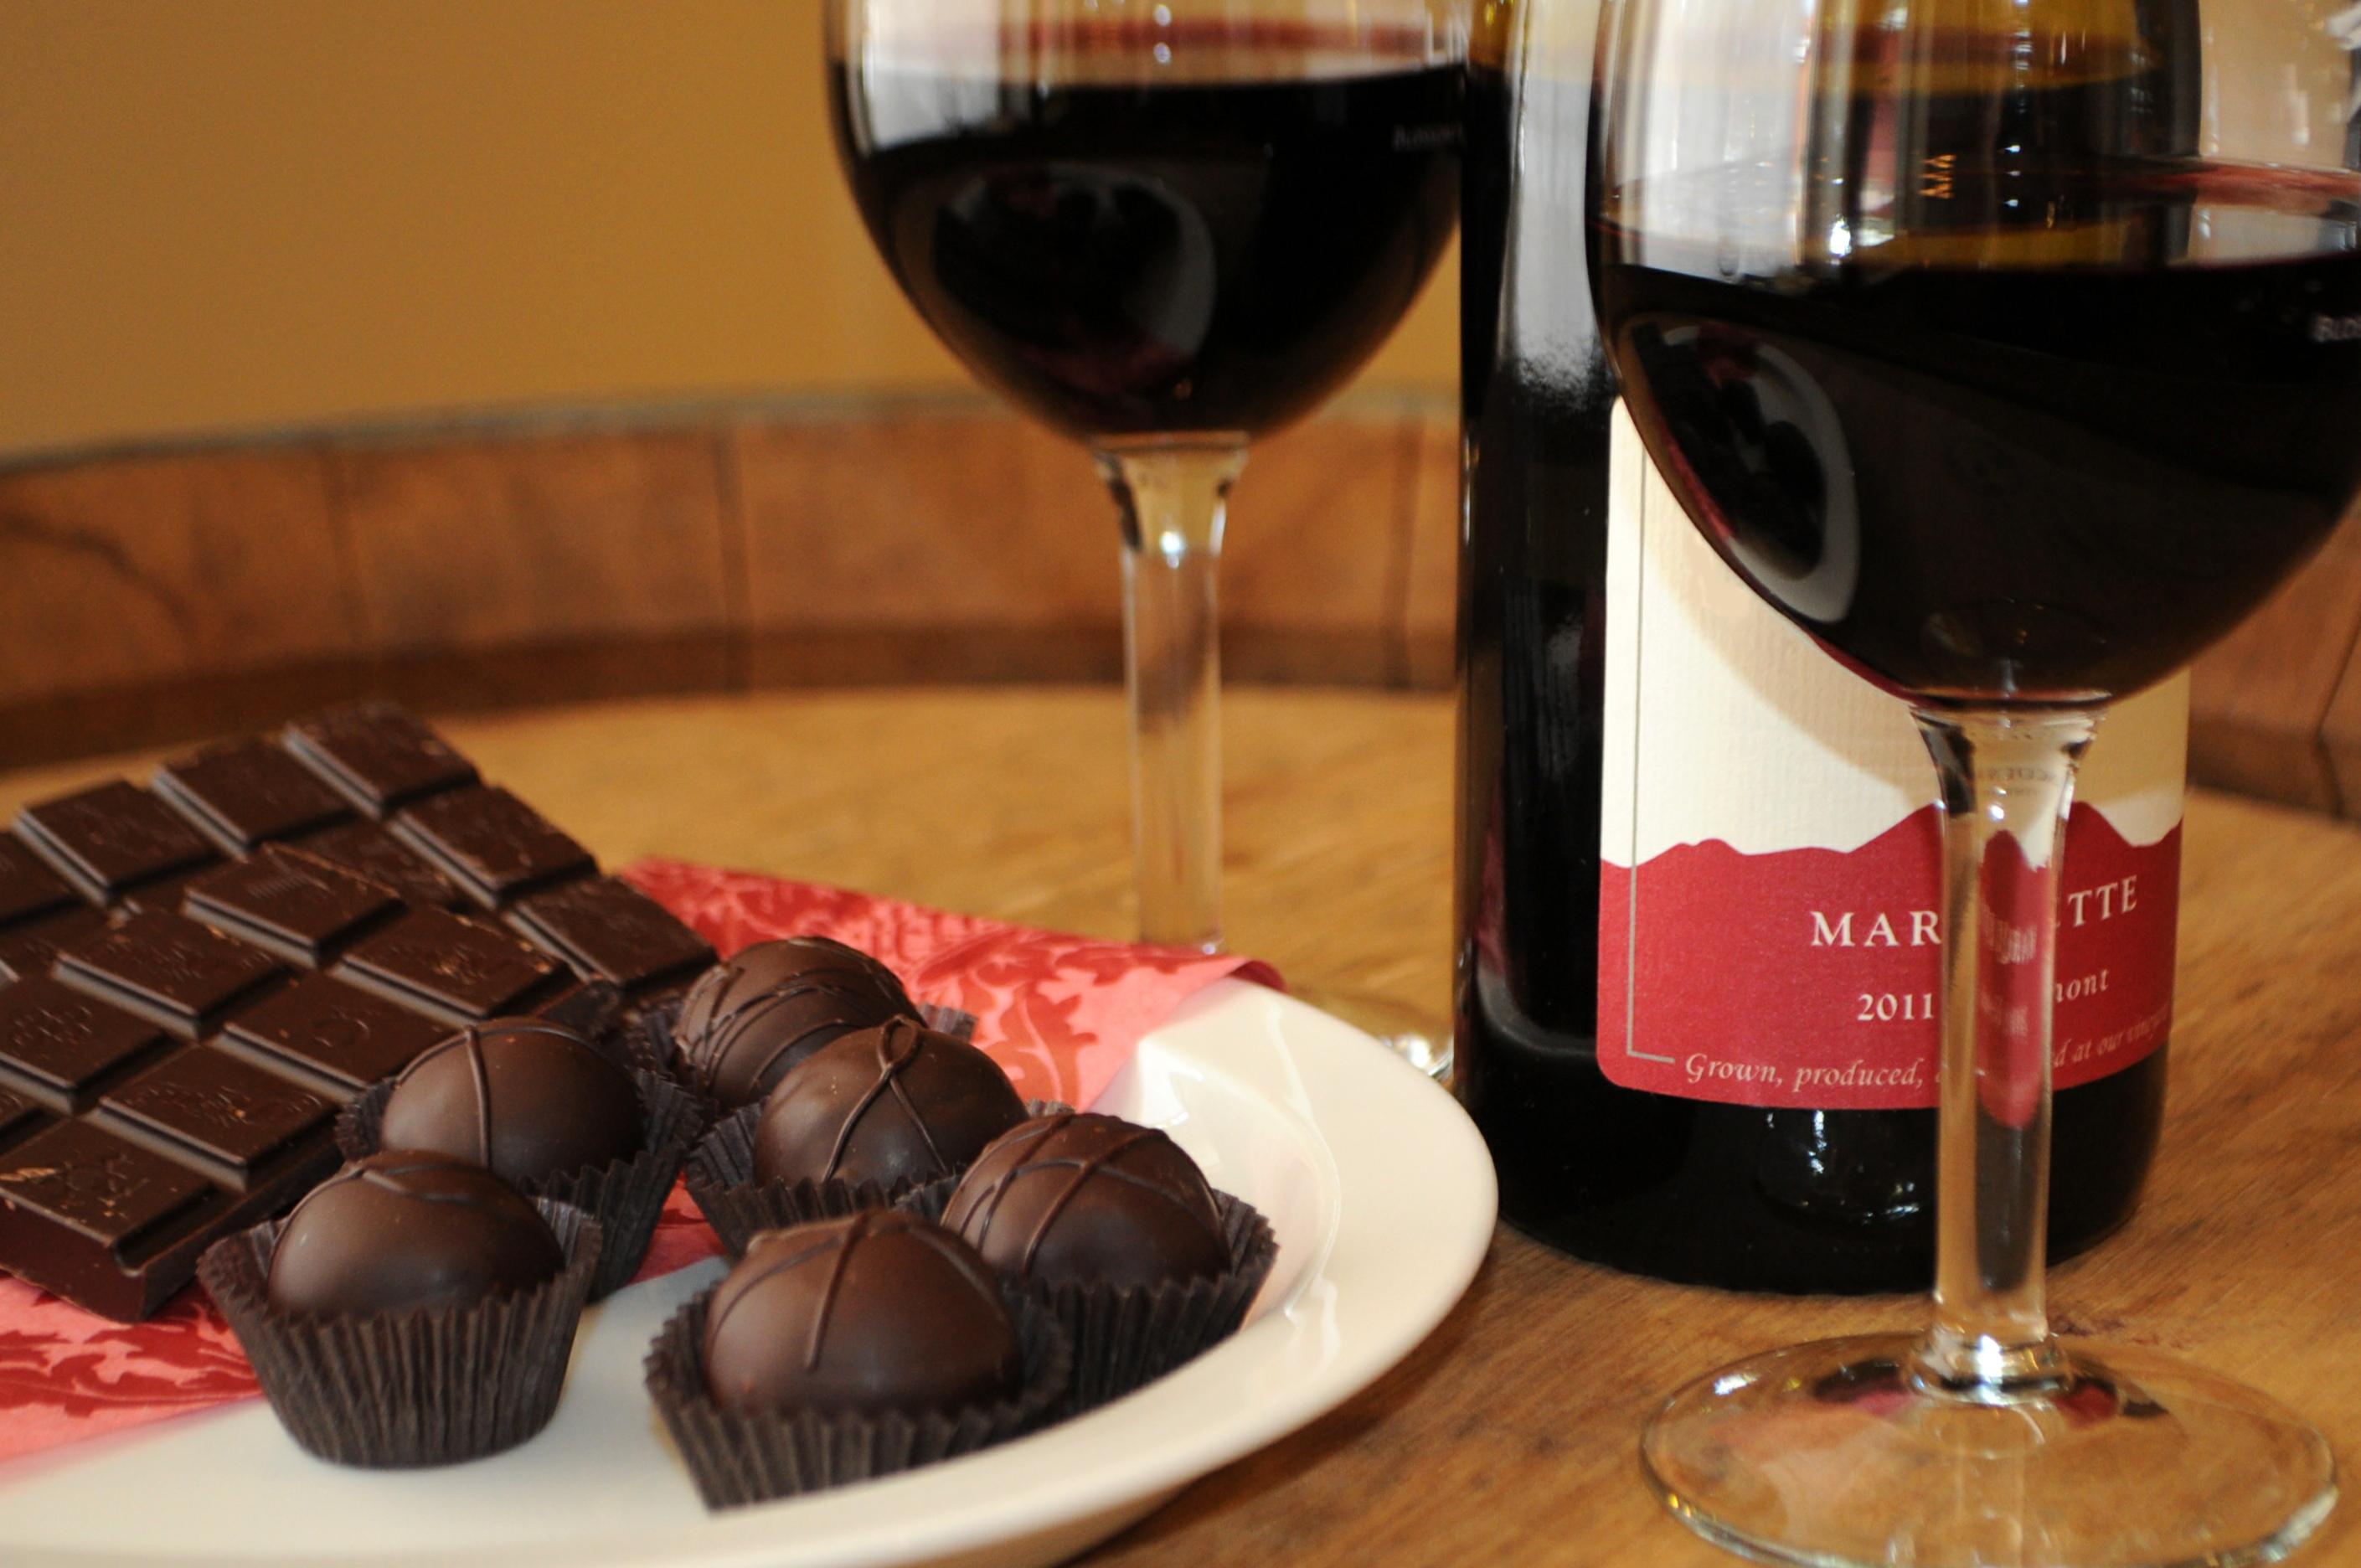 Wine and chocolate photo